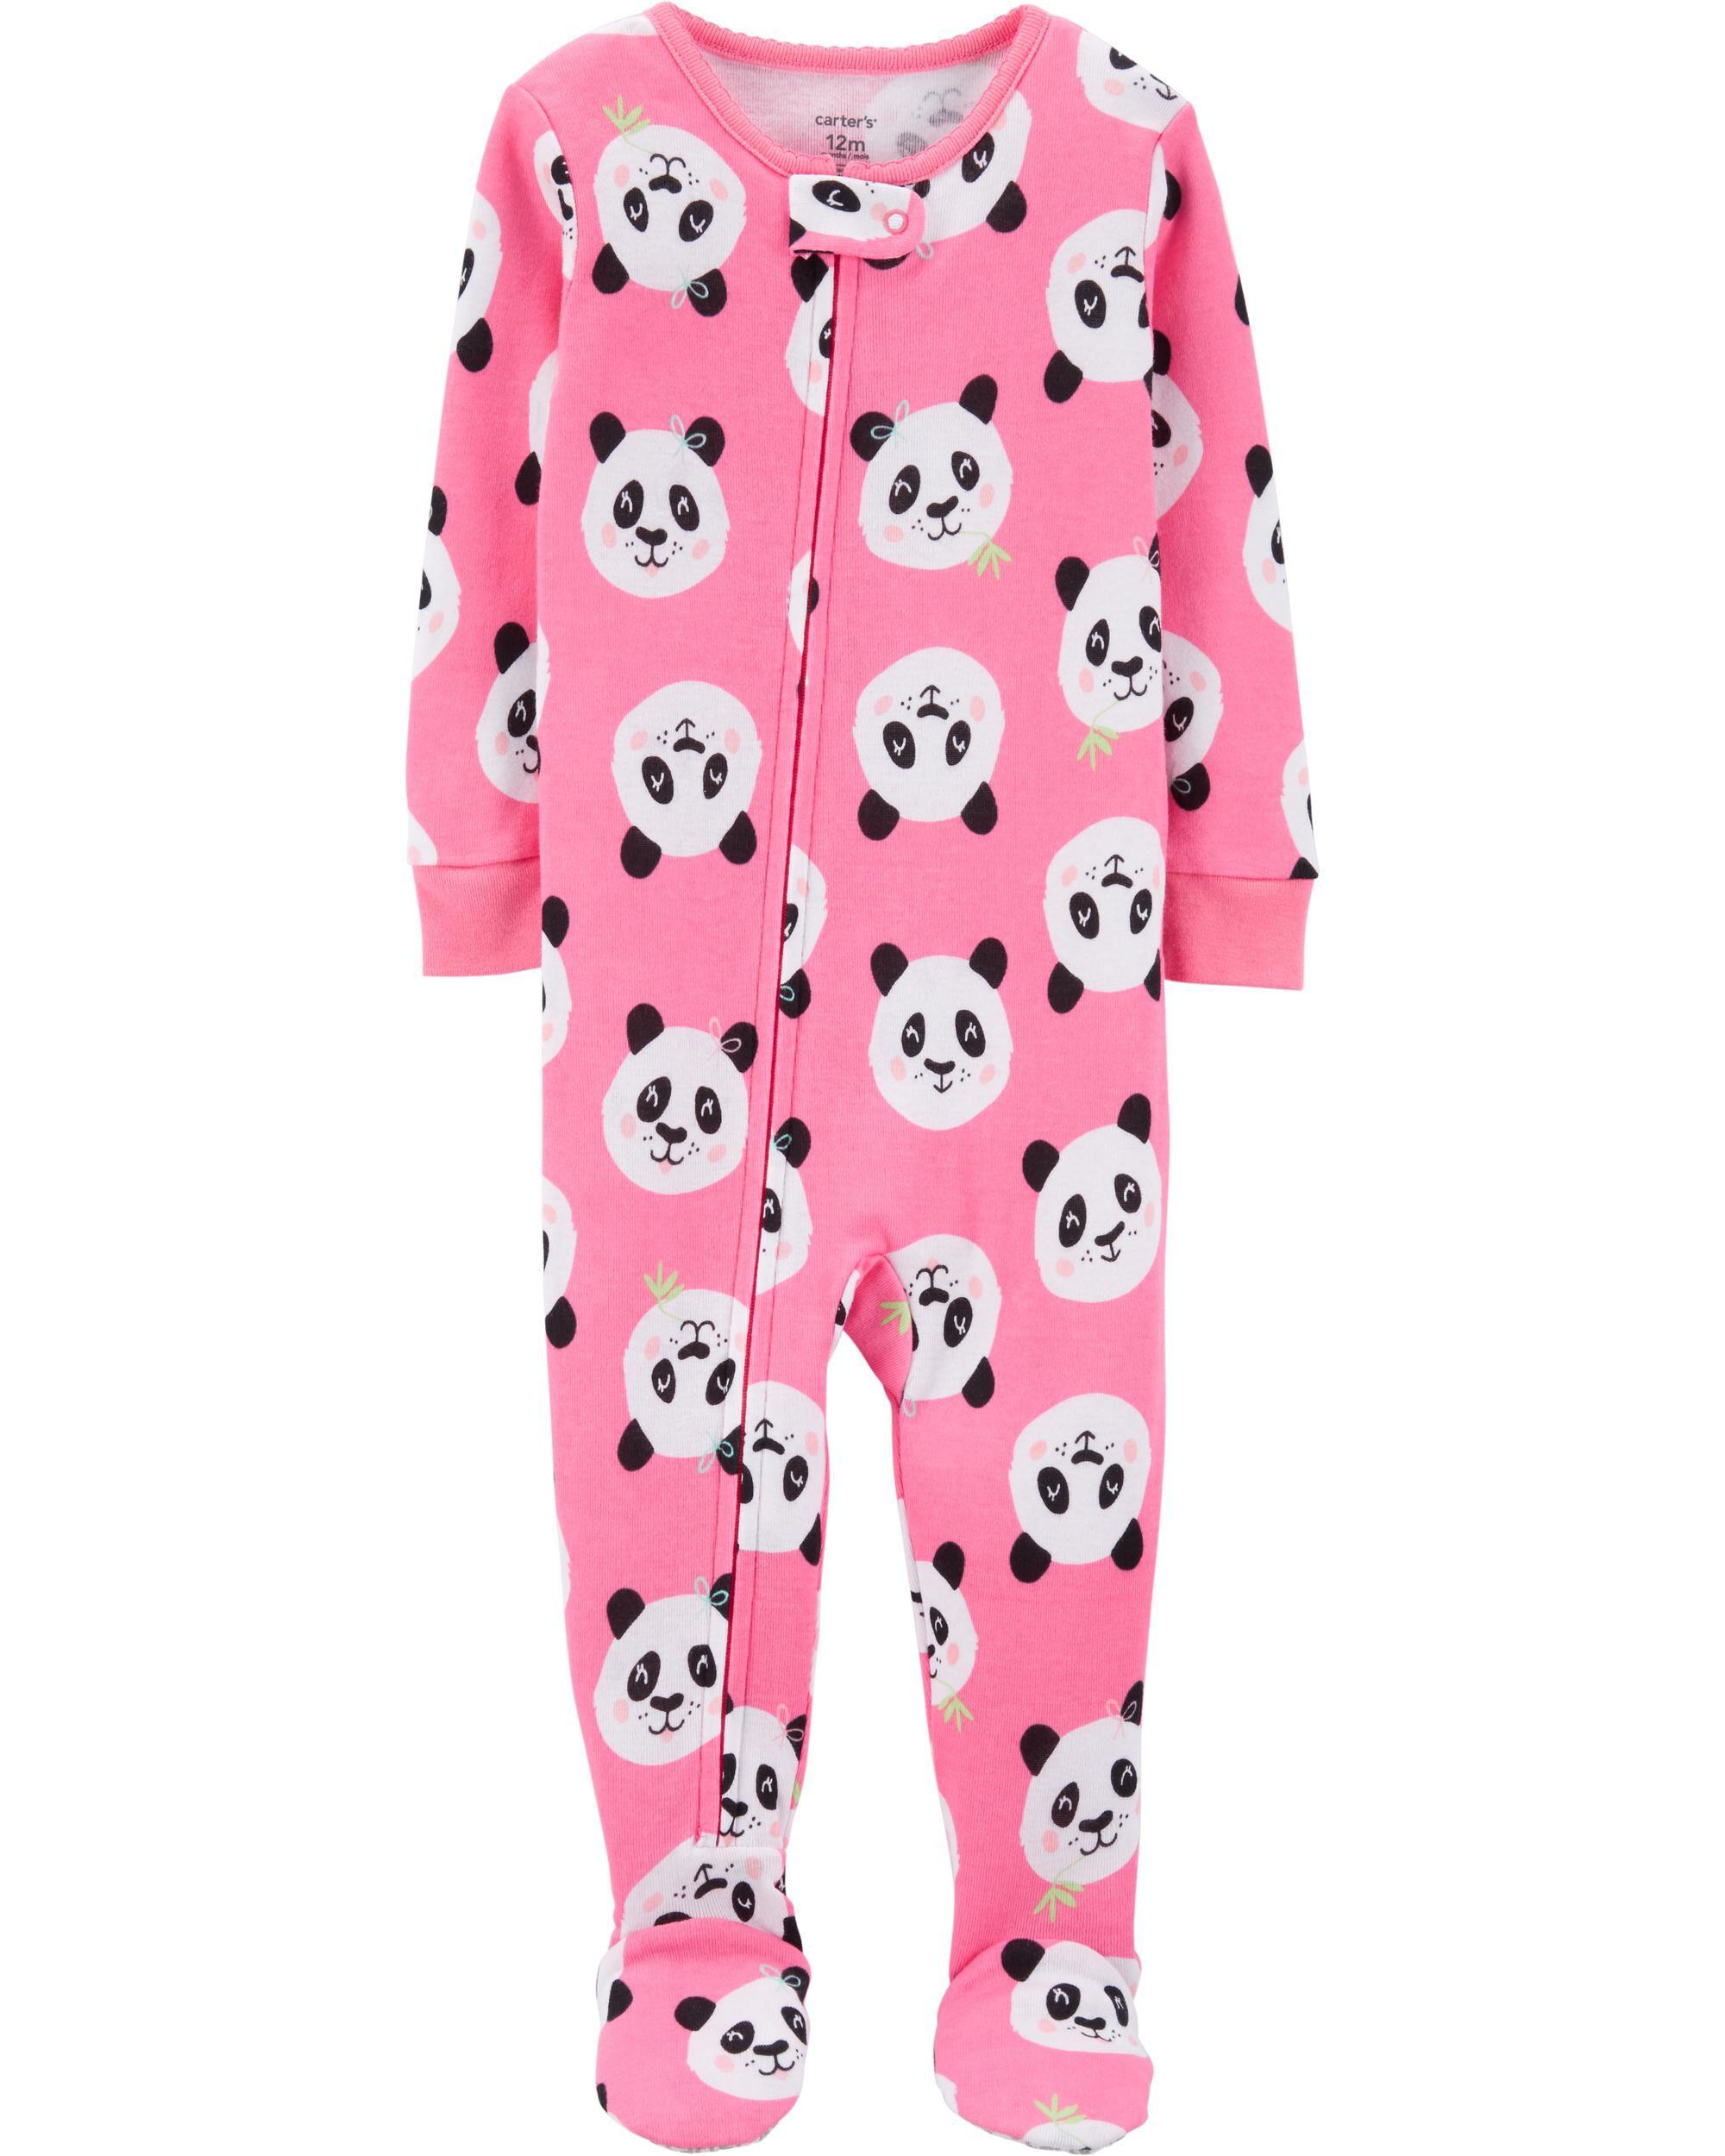 1 Piece Panda Snug Fit Cotton Footie Pjs Carter S